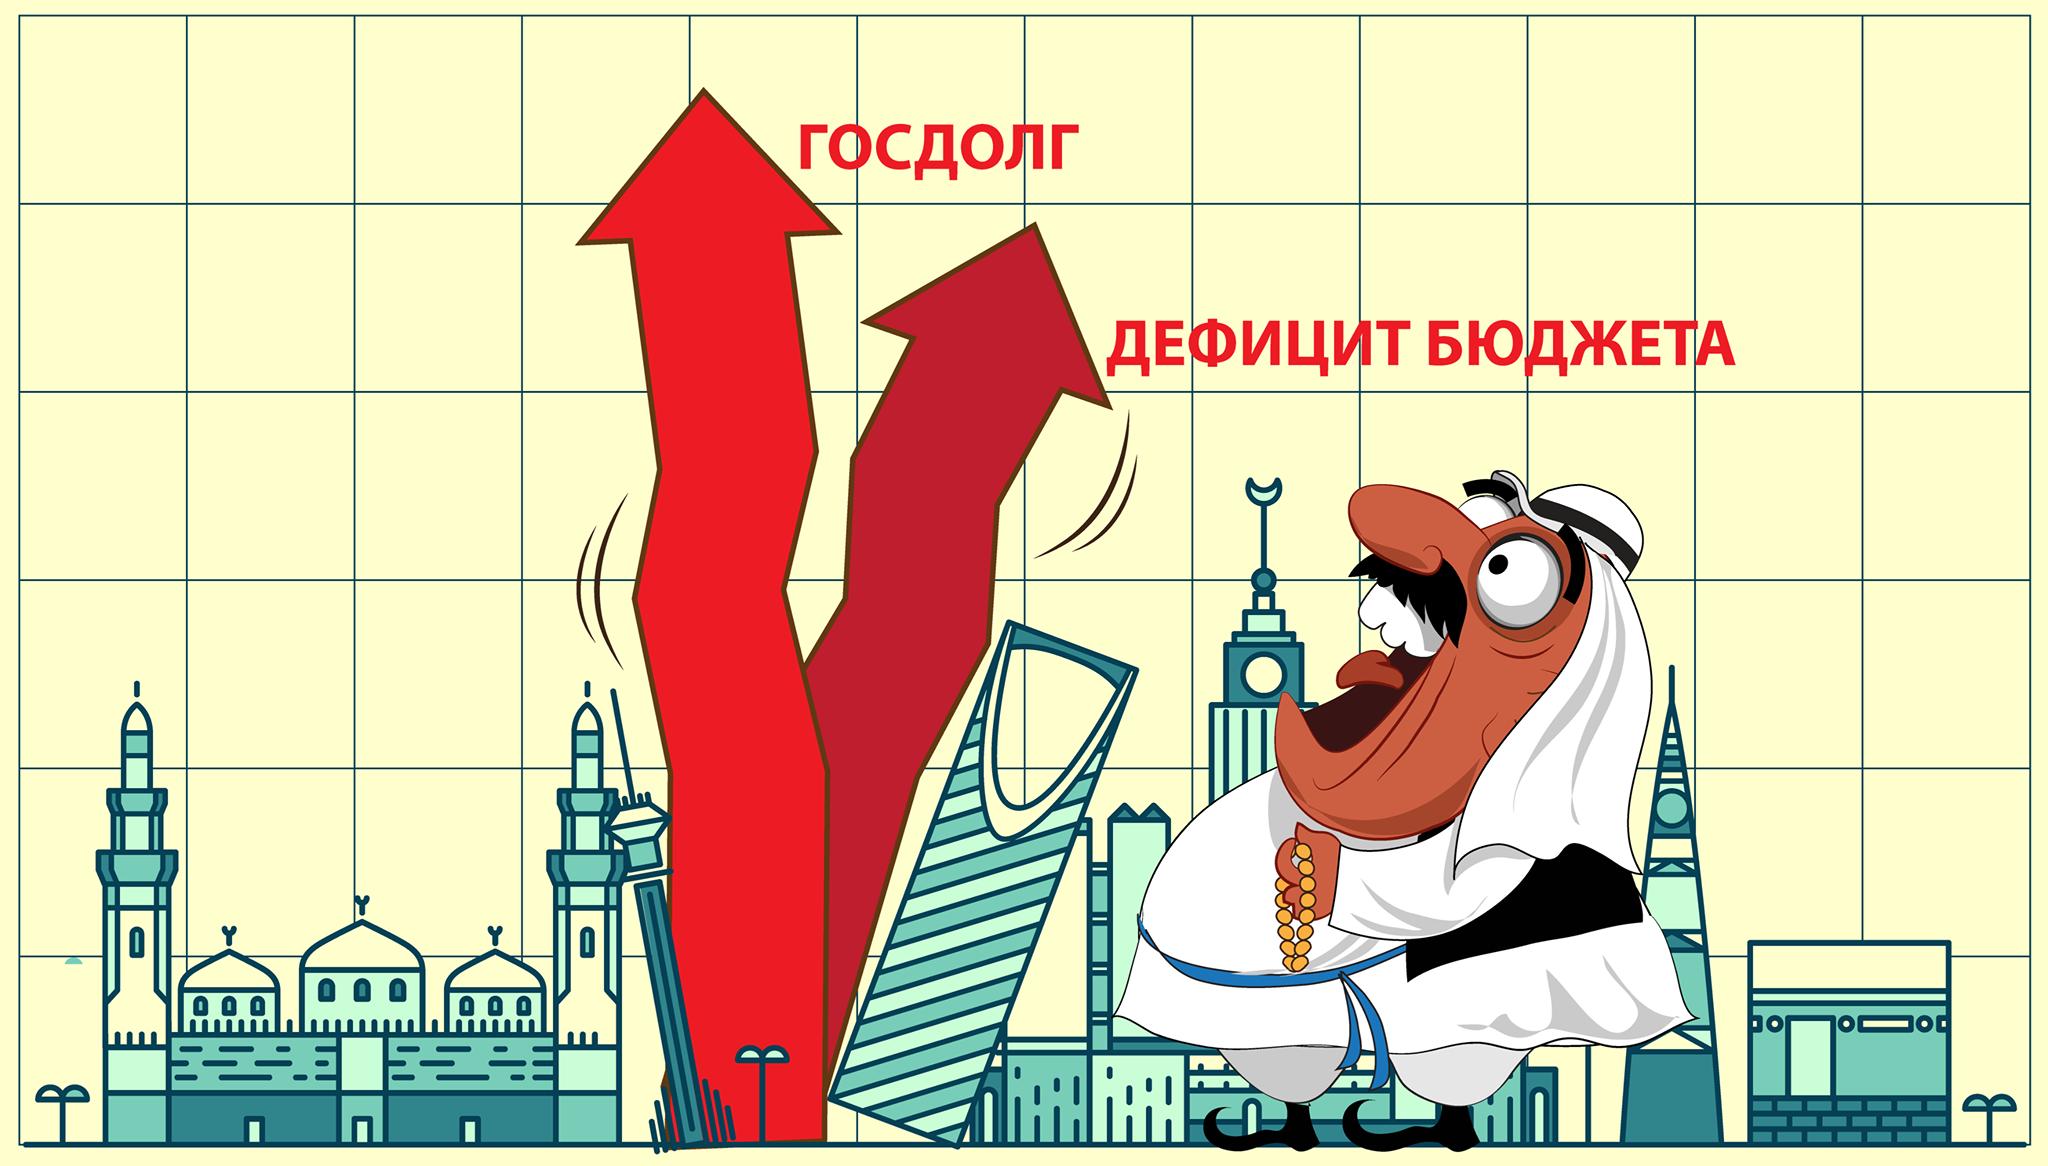 http://neftianka.ru/wp-content/uploads/2019/11/76778206_3042137386011418_8314745871157690368_n-2048x1166.png